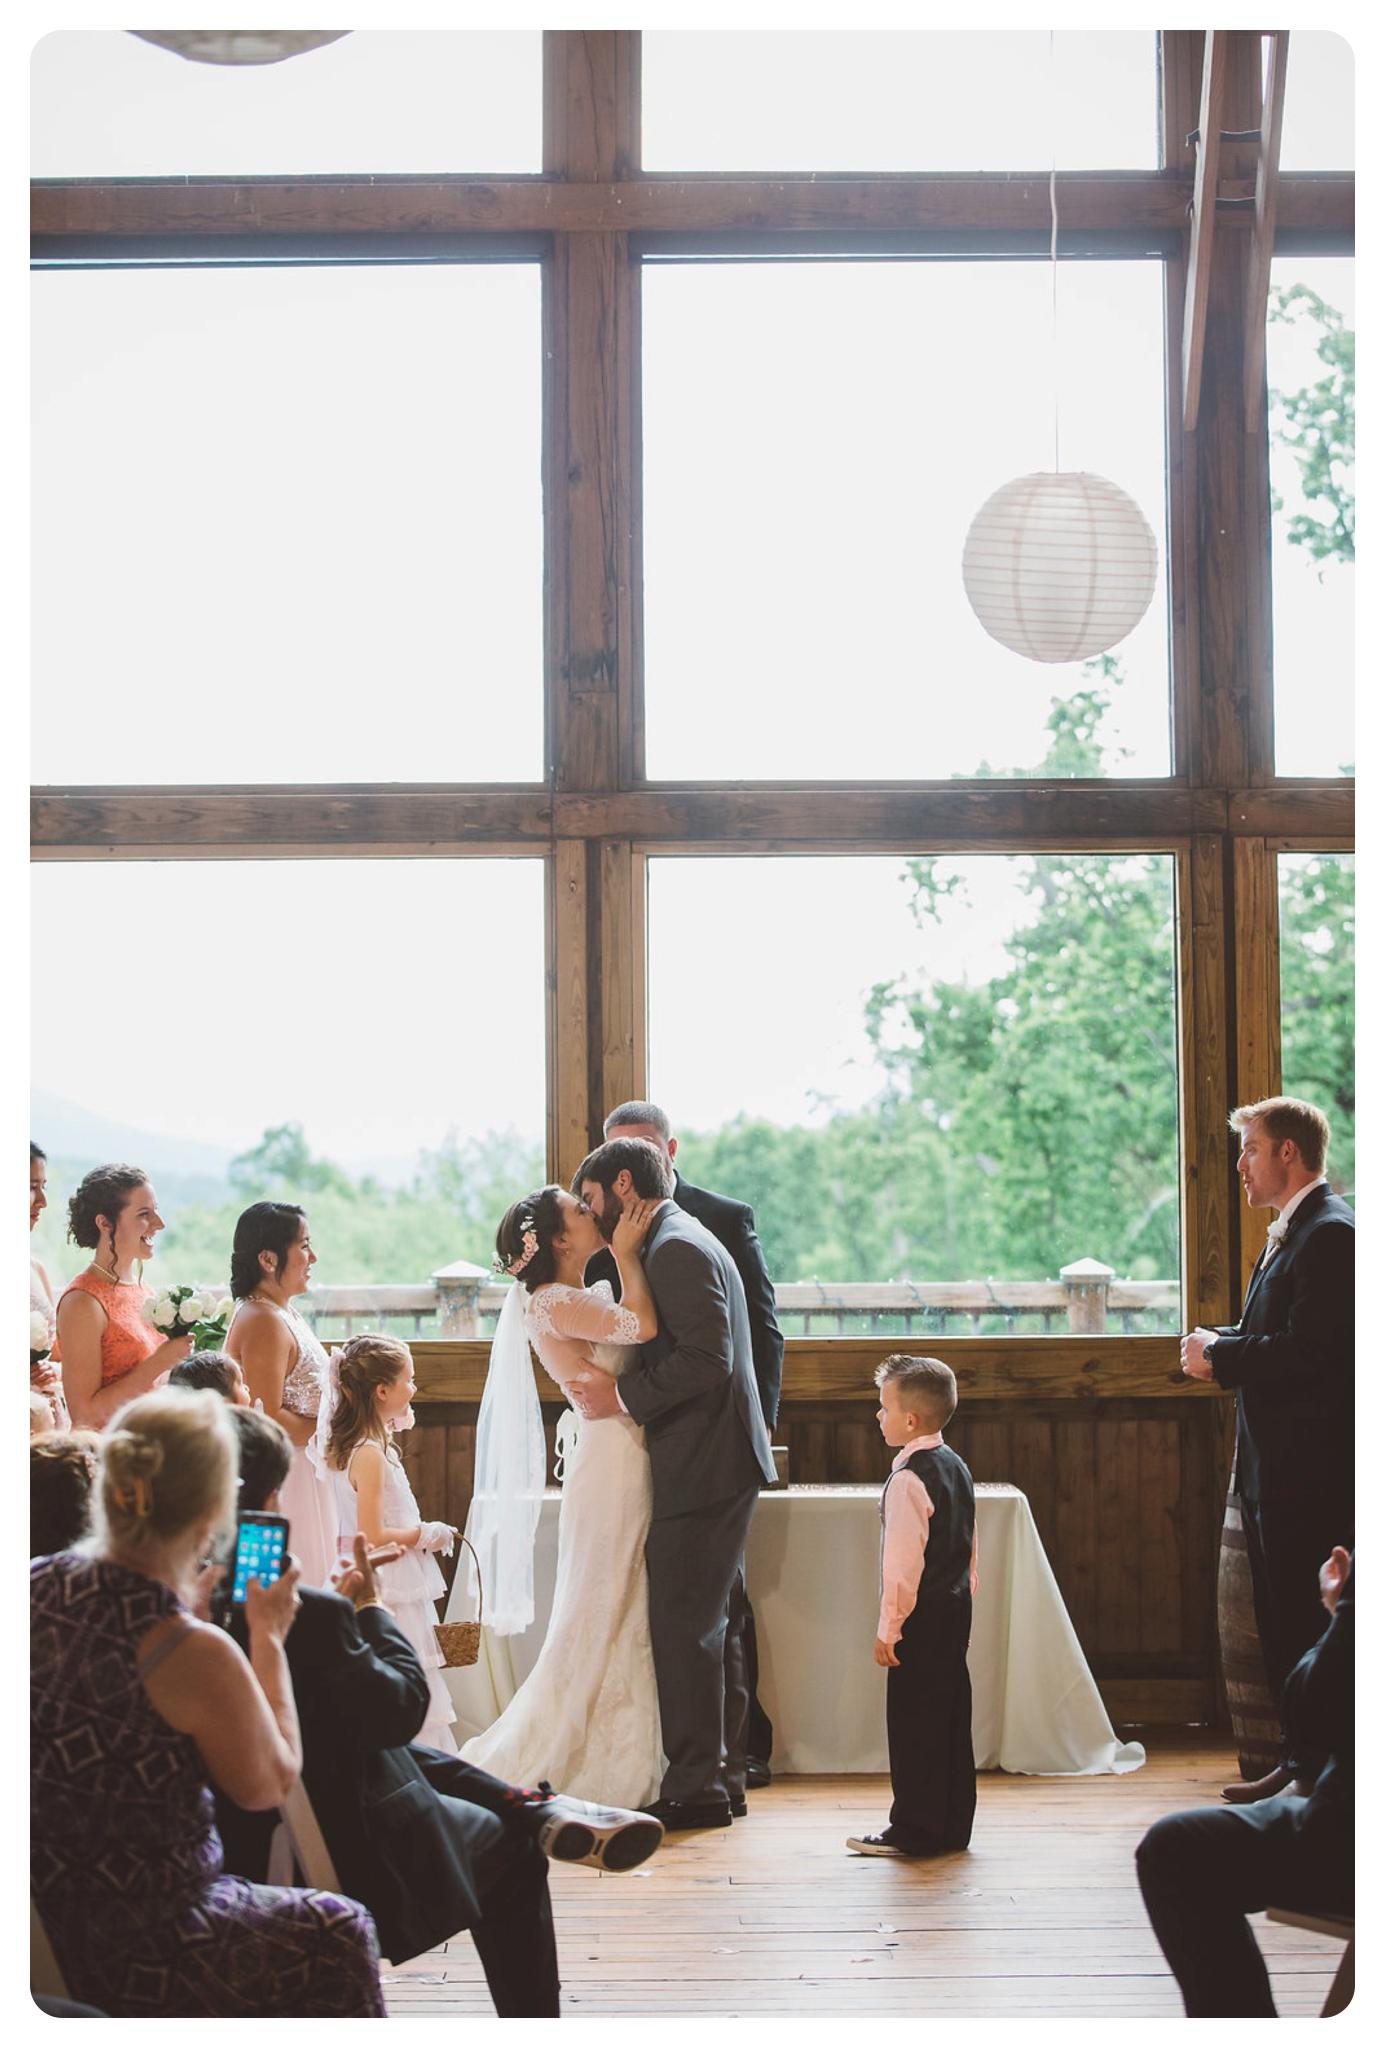 Braeloch-Weddings-Wedding-Photographer-Pat-Cori-Photography-024.jpg